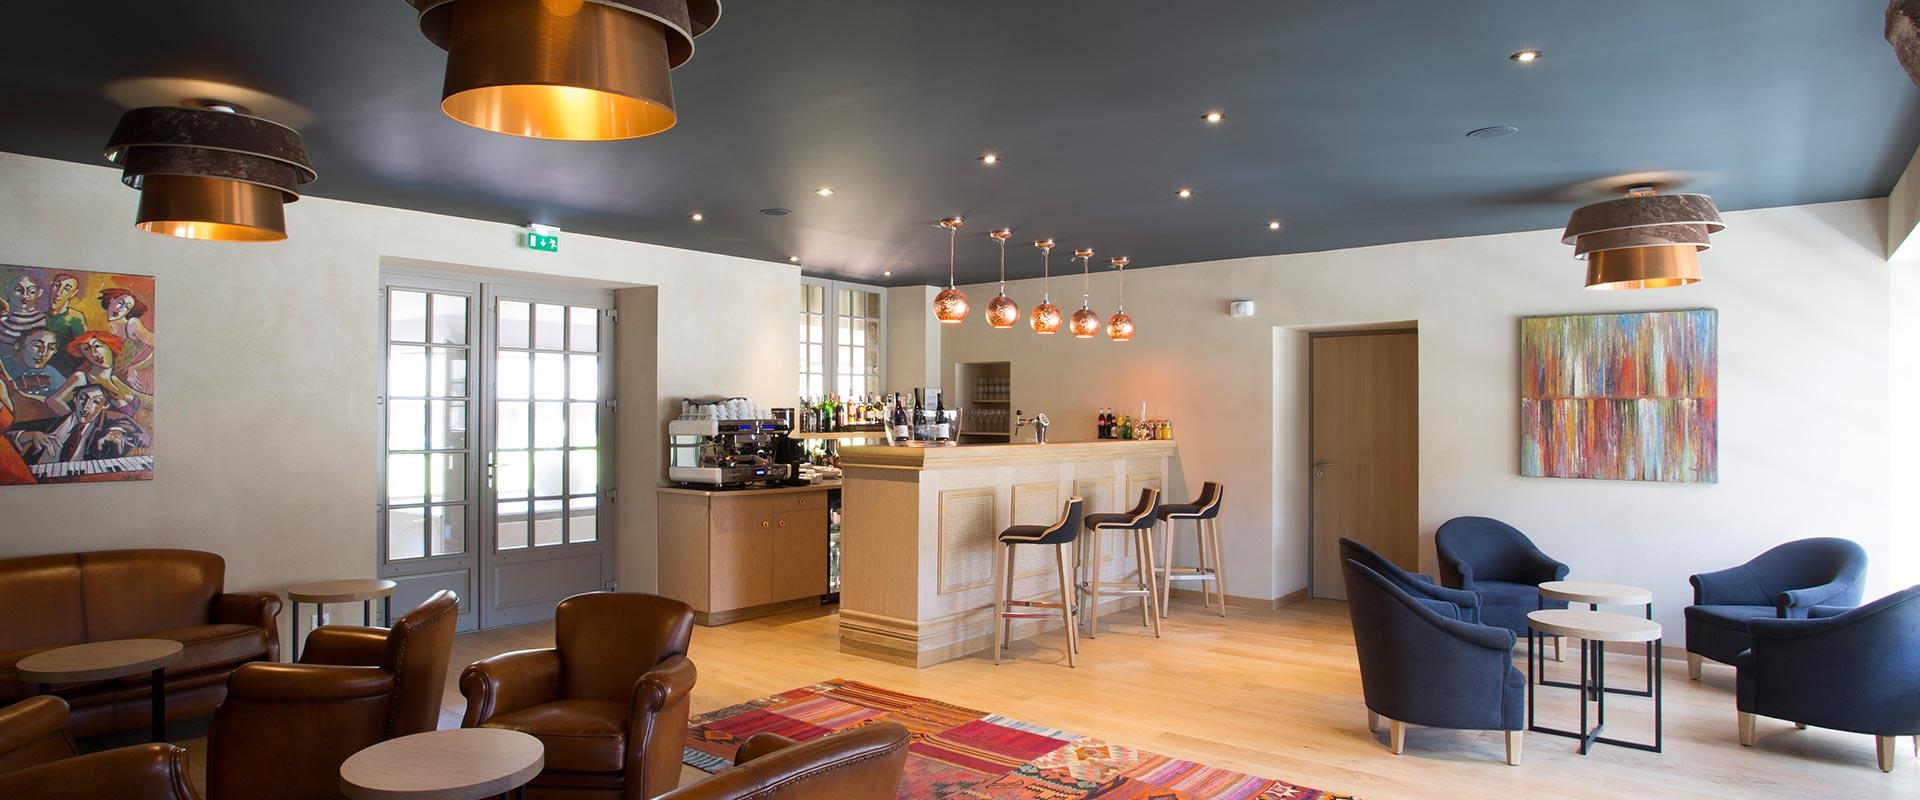 Bar / Lounge de l'hotel de l'Abbaye